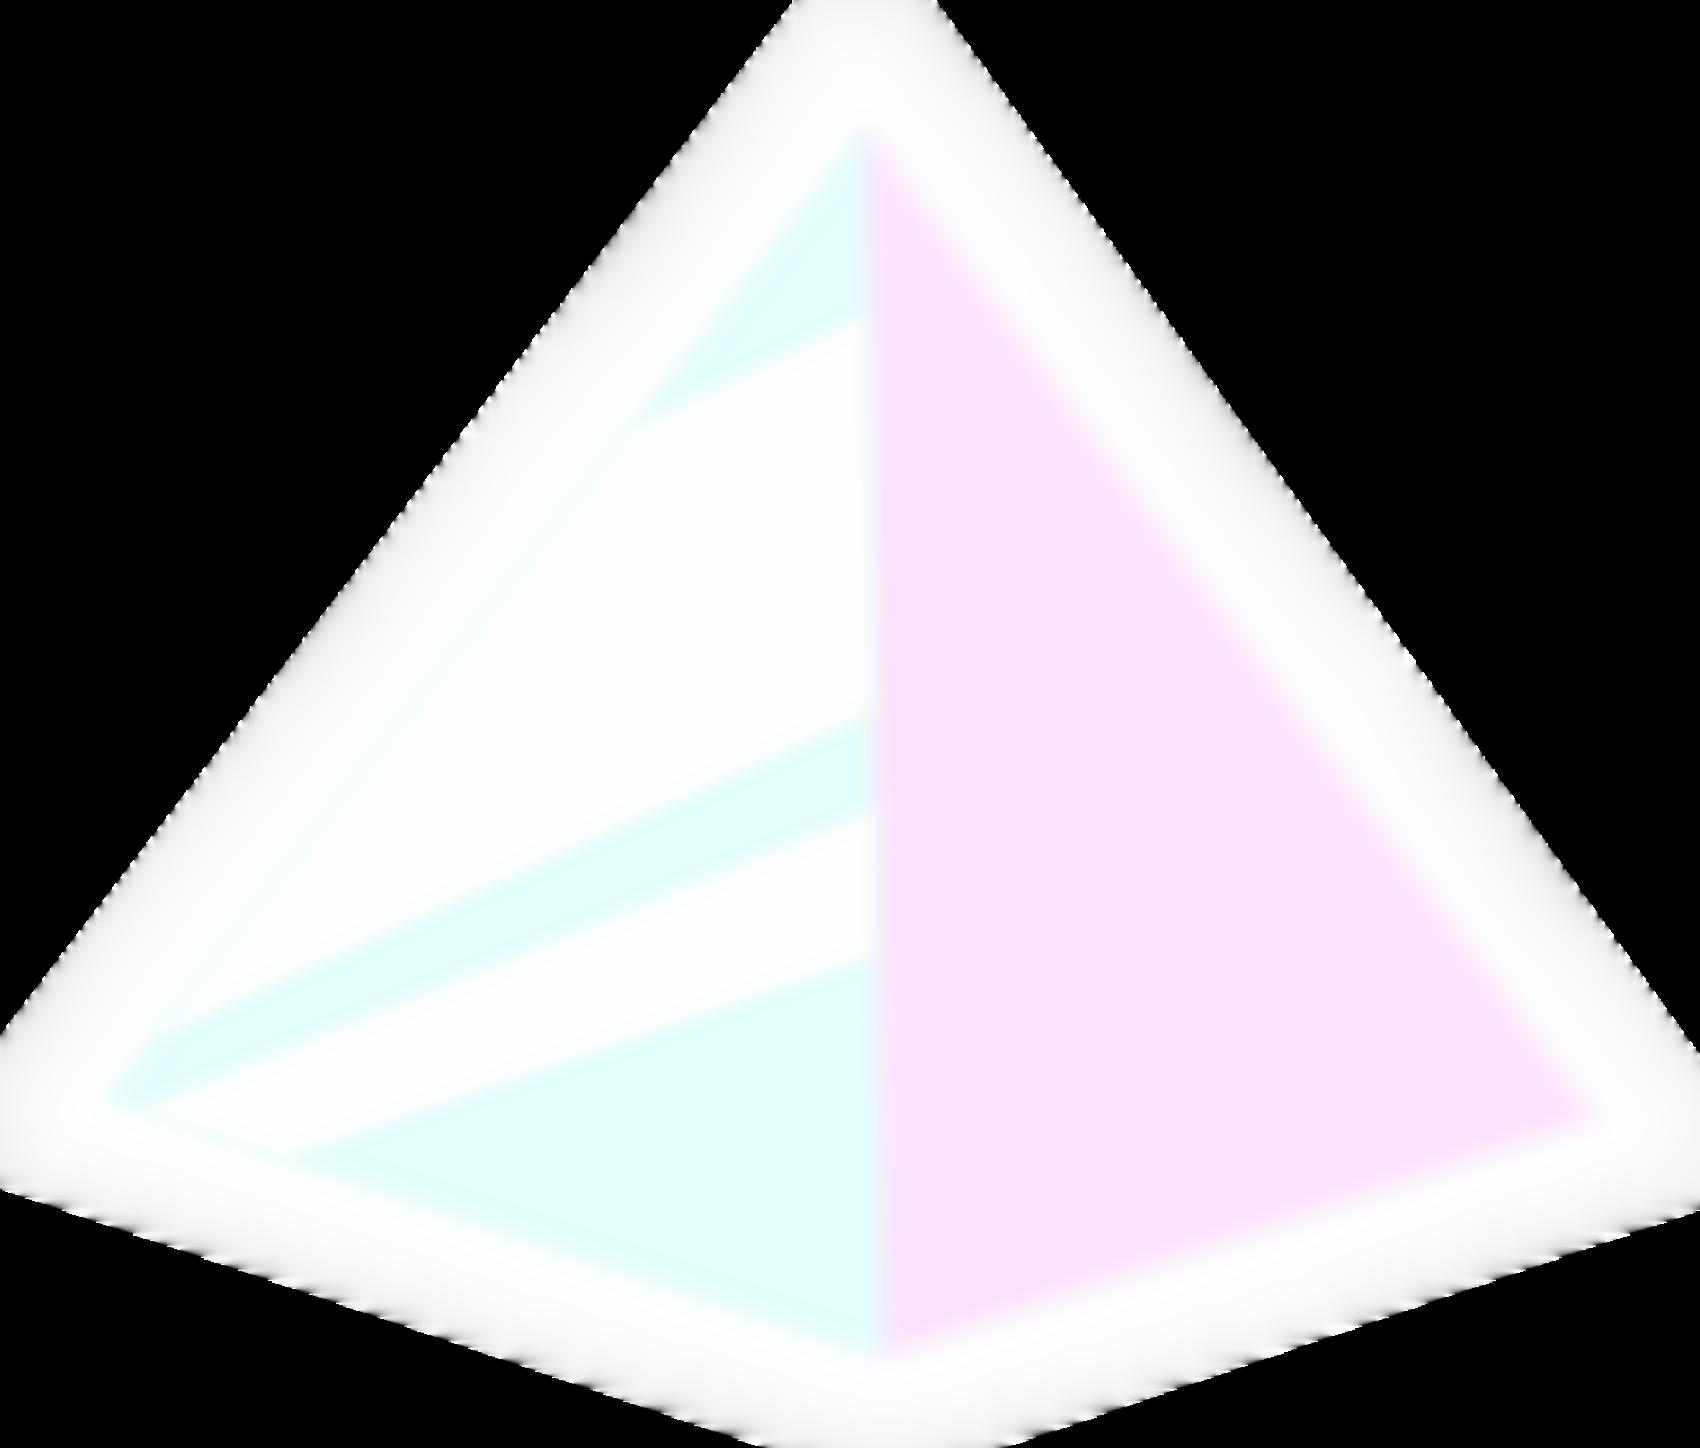 light prism steven universe - HD1700×1448